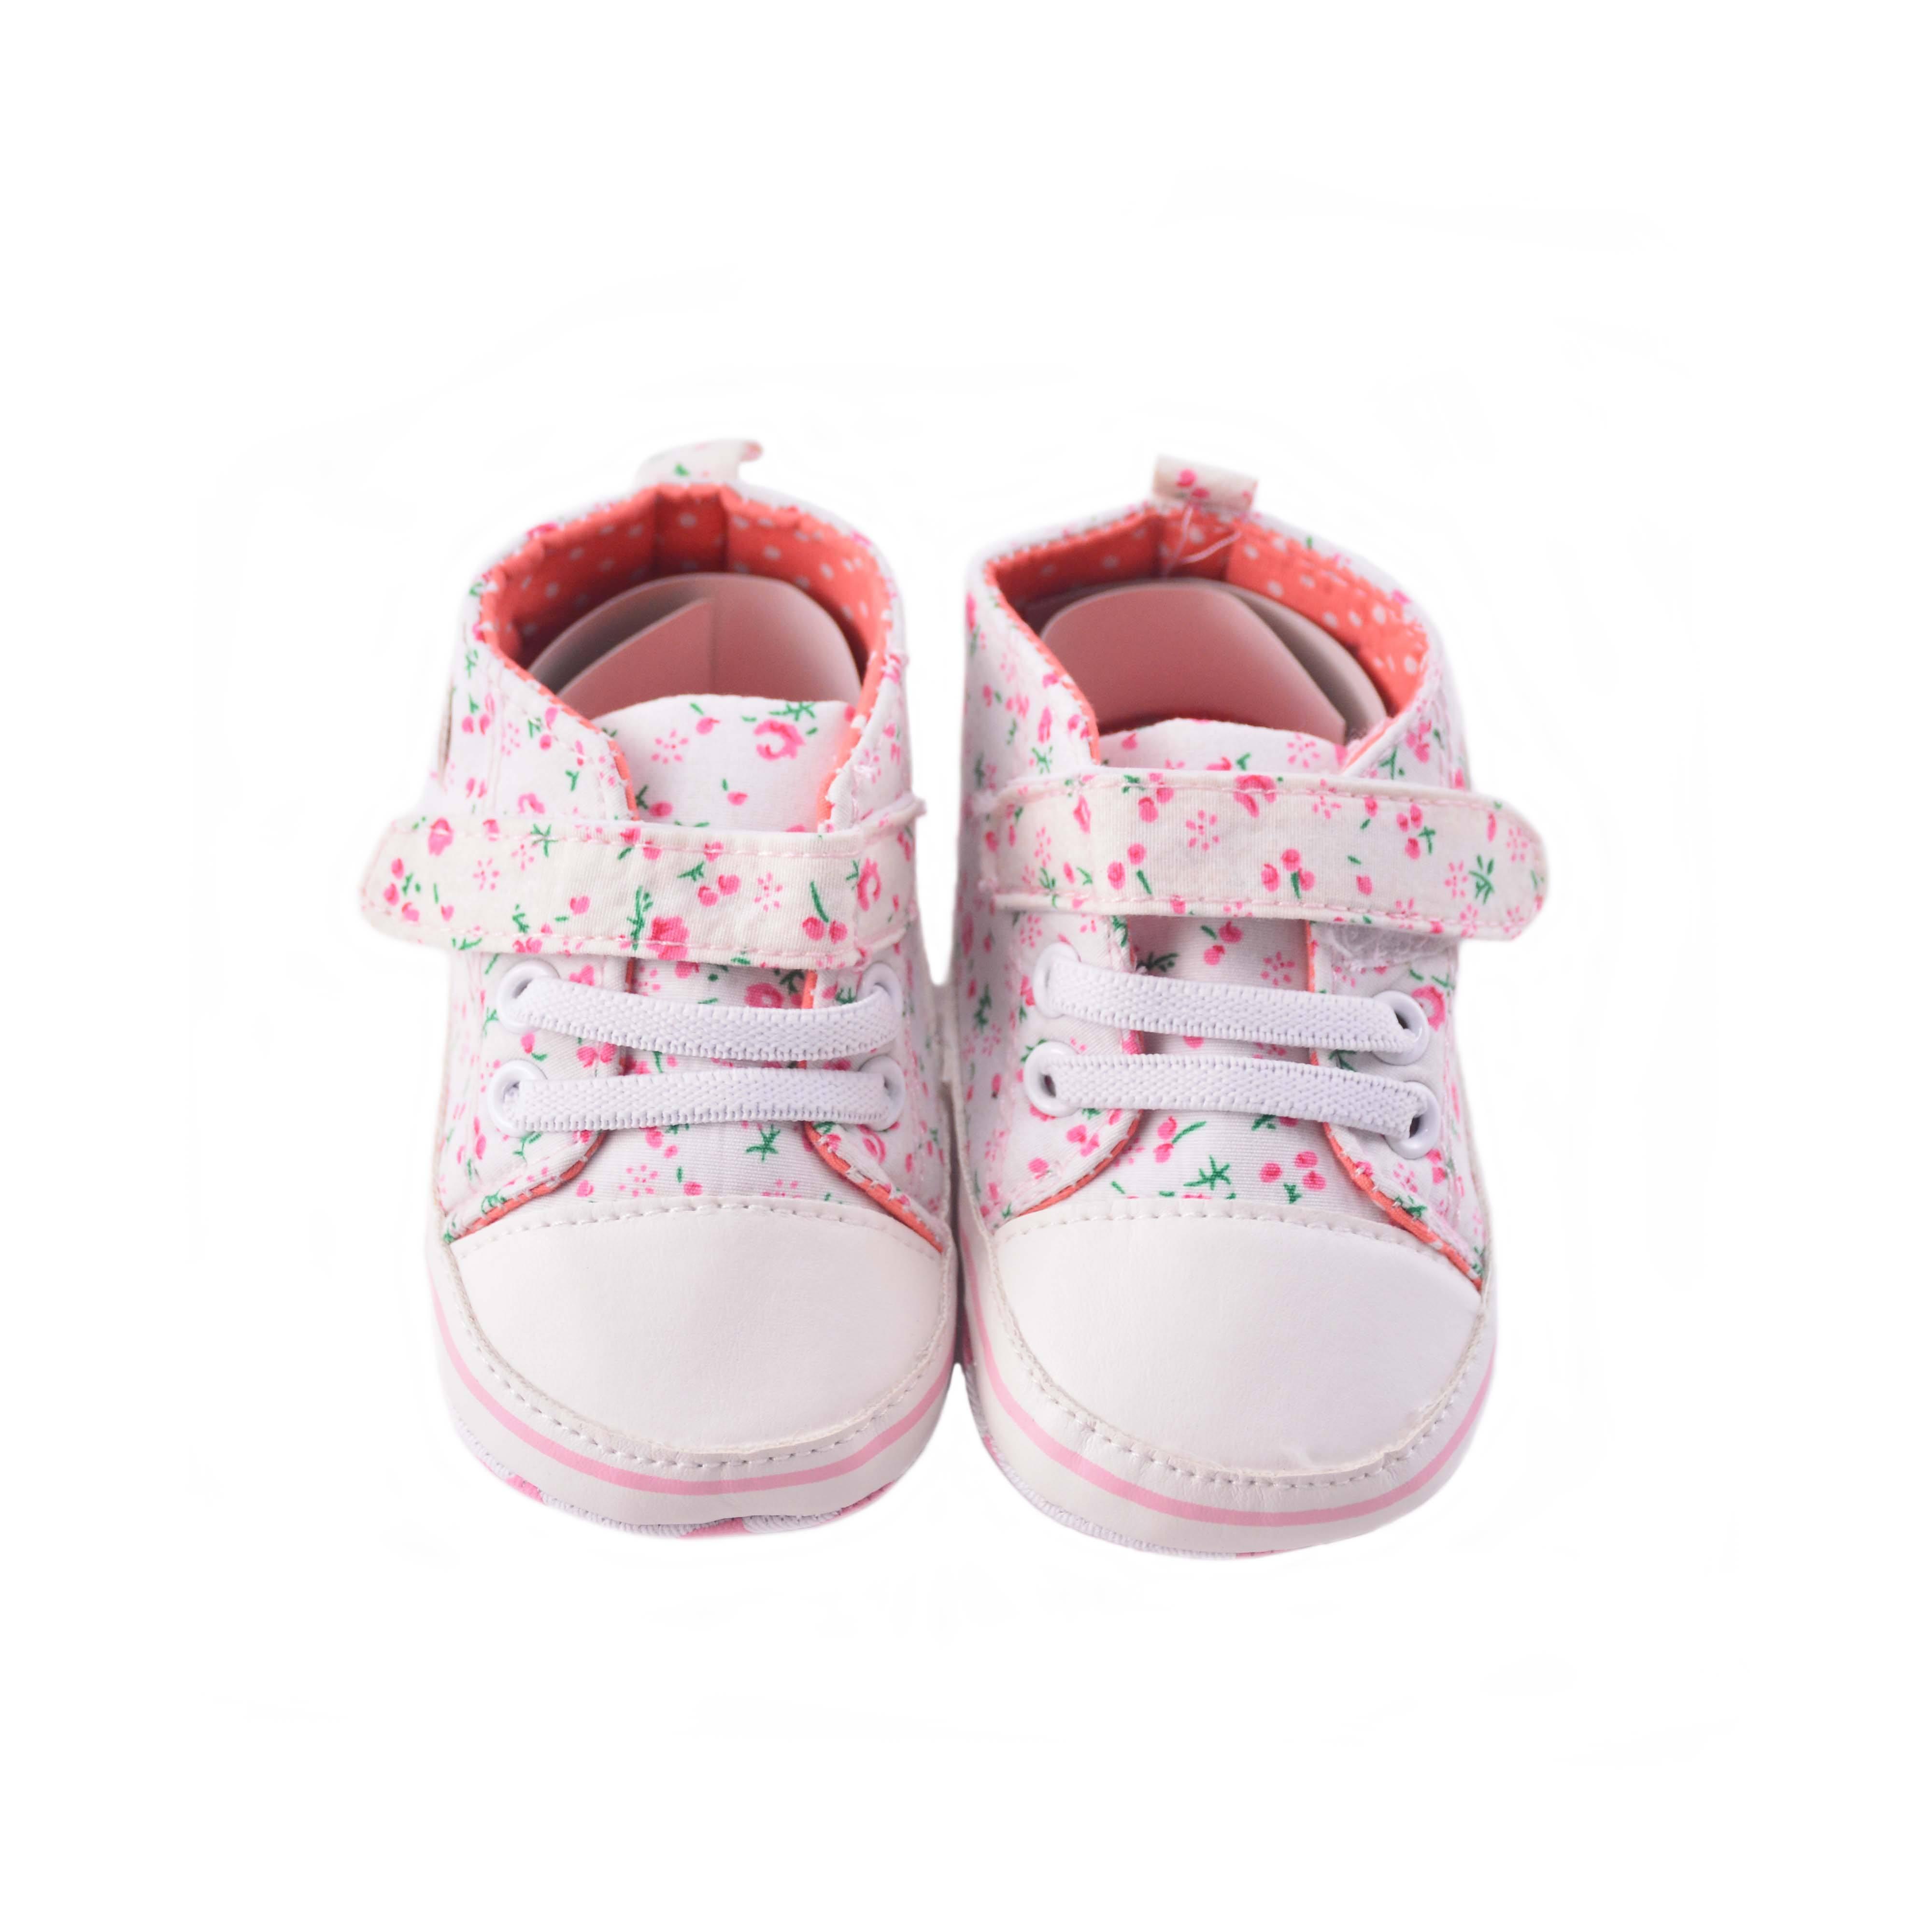 Flower Print Poplin Crib Shoes Infant